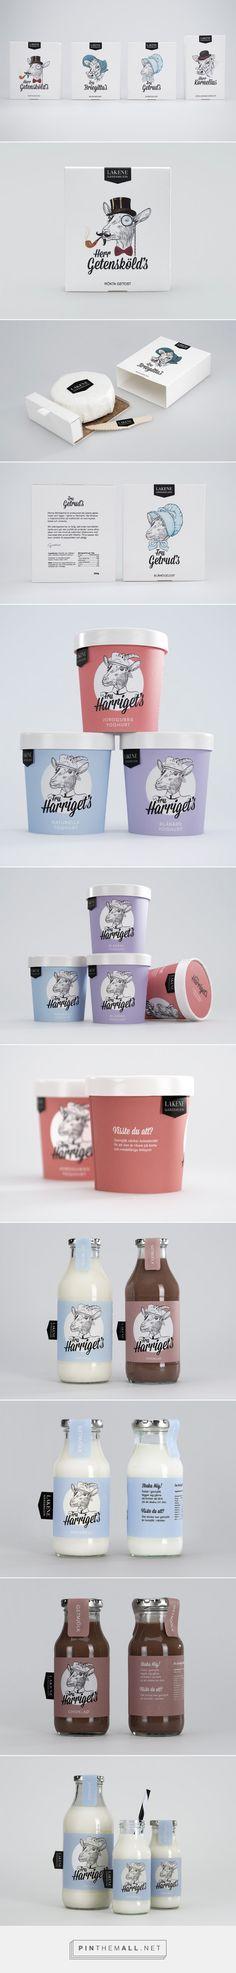 Lakene Gårdsmejeri #Dairy #packaging designed by Frida Ekelund, Jasper van Wolferen, Ronja Hallgren, Maarit Hautamäki - http://www.packagingoftheworld.com/2015/05/lakene-gardsmejeri-student-project.html